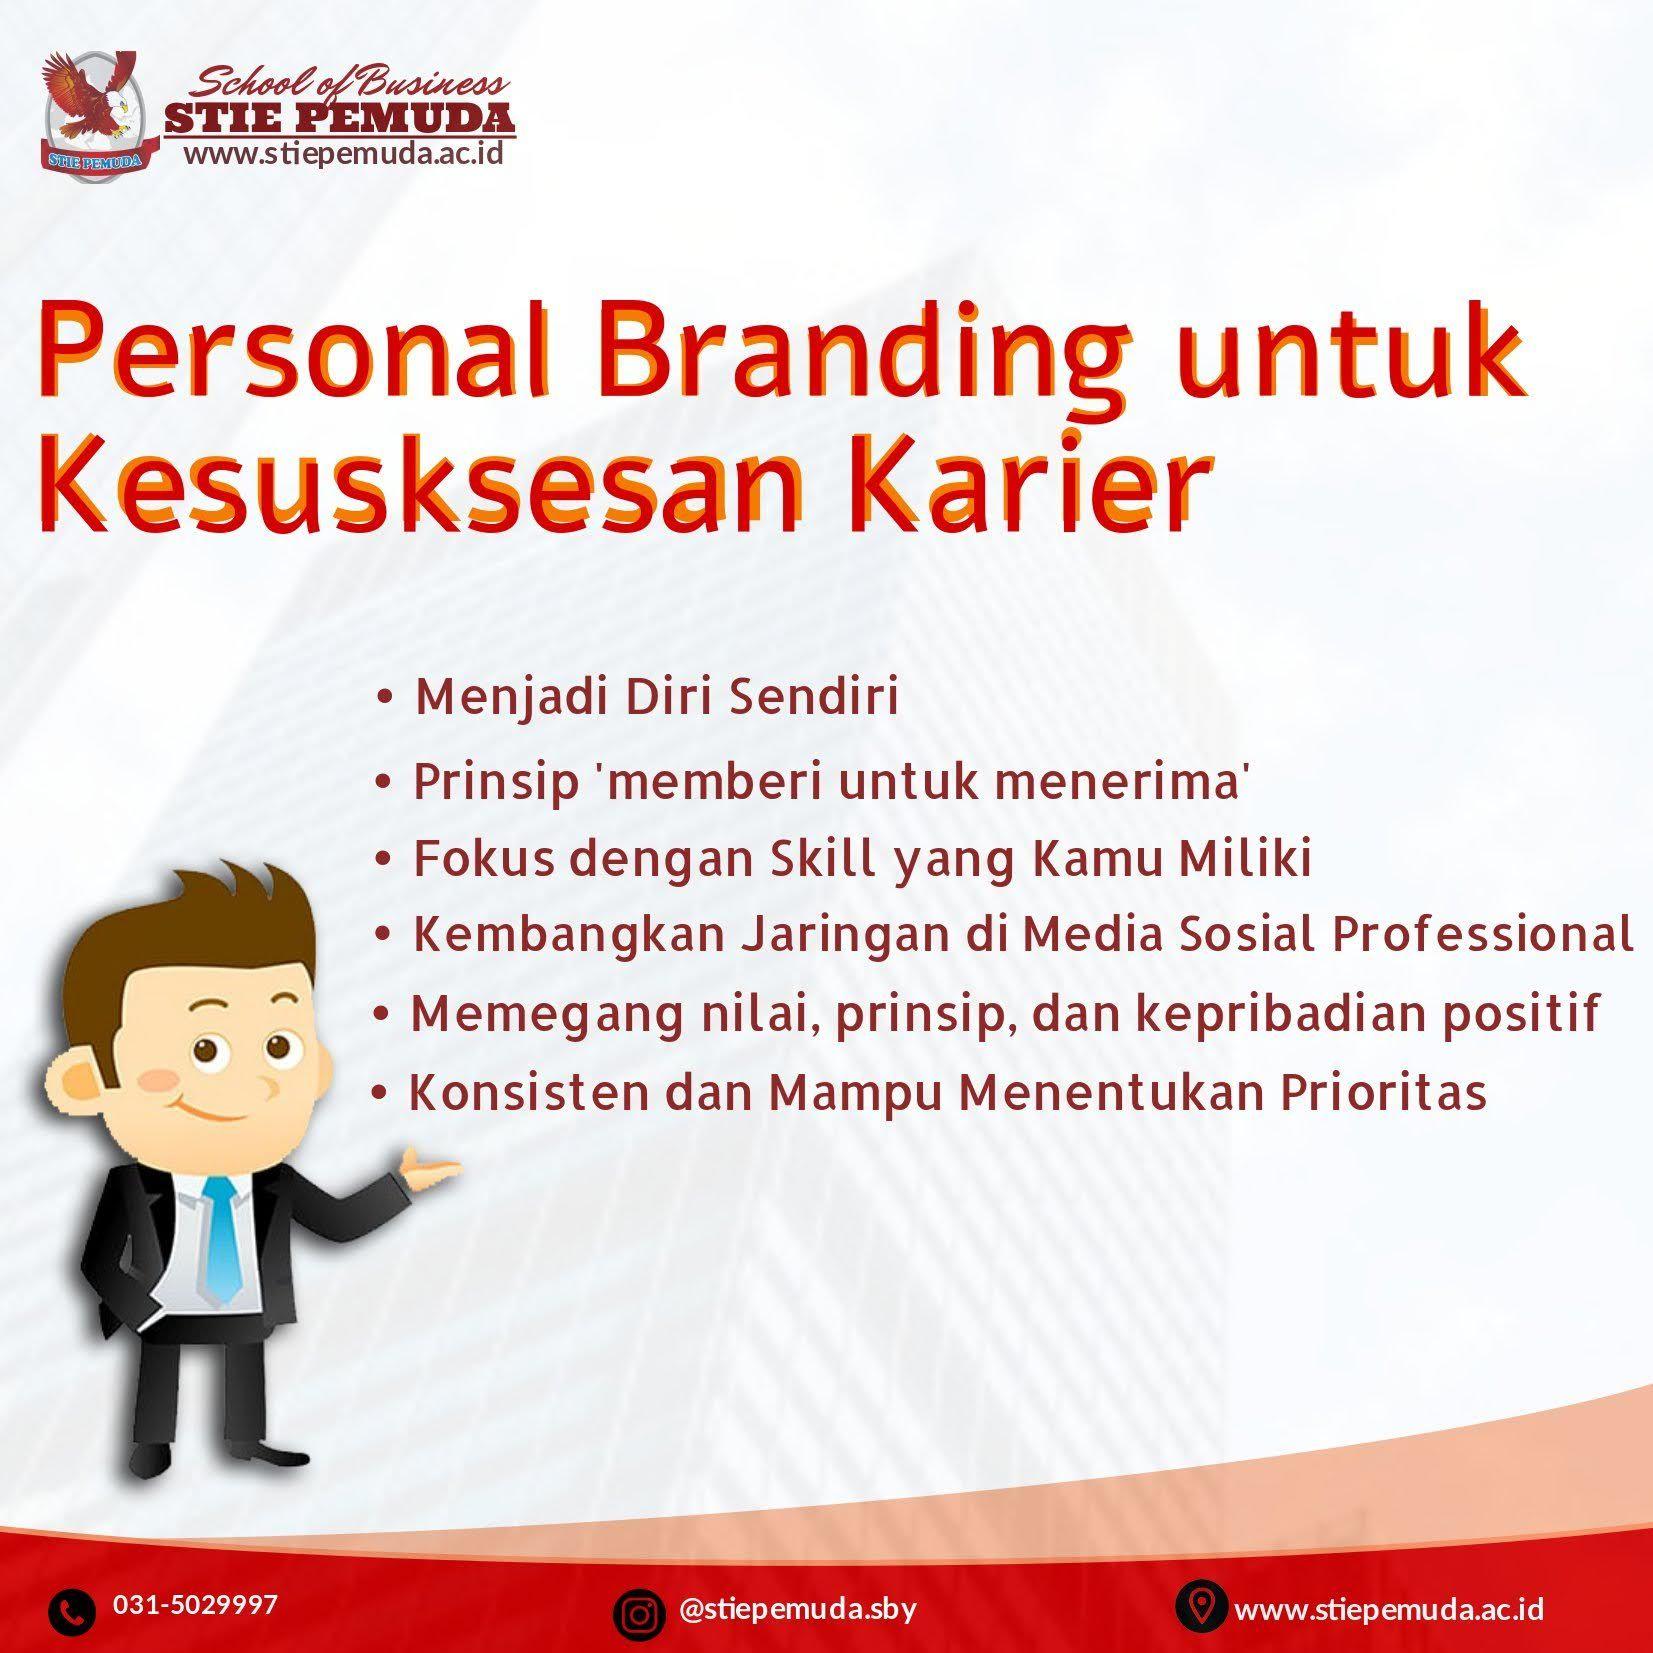 Personal Branding Personal Branding Branding Motivasi